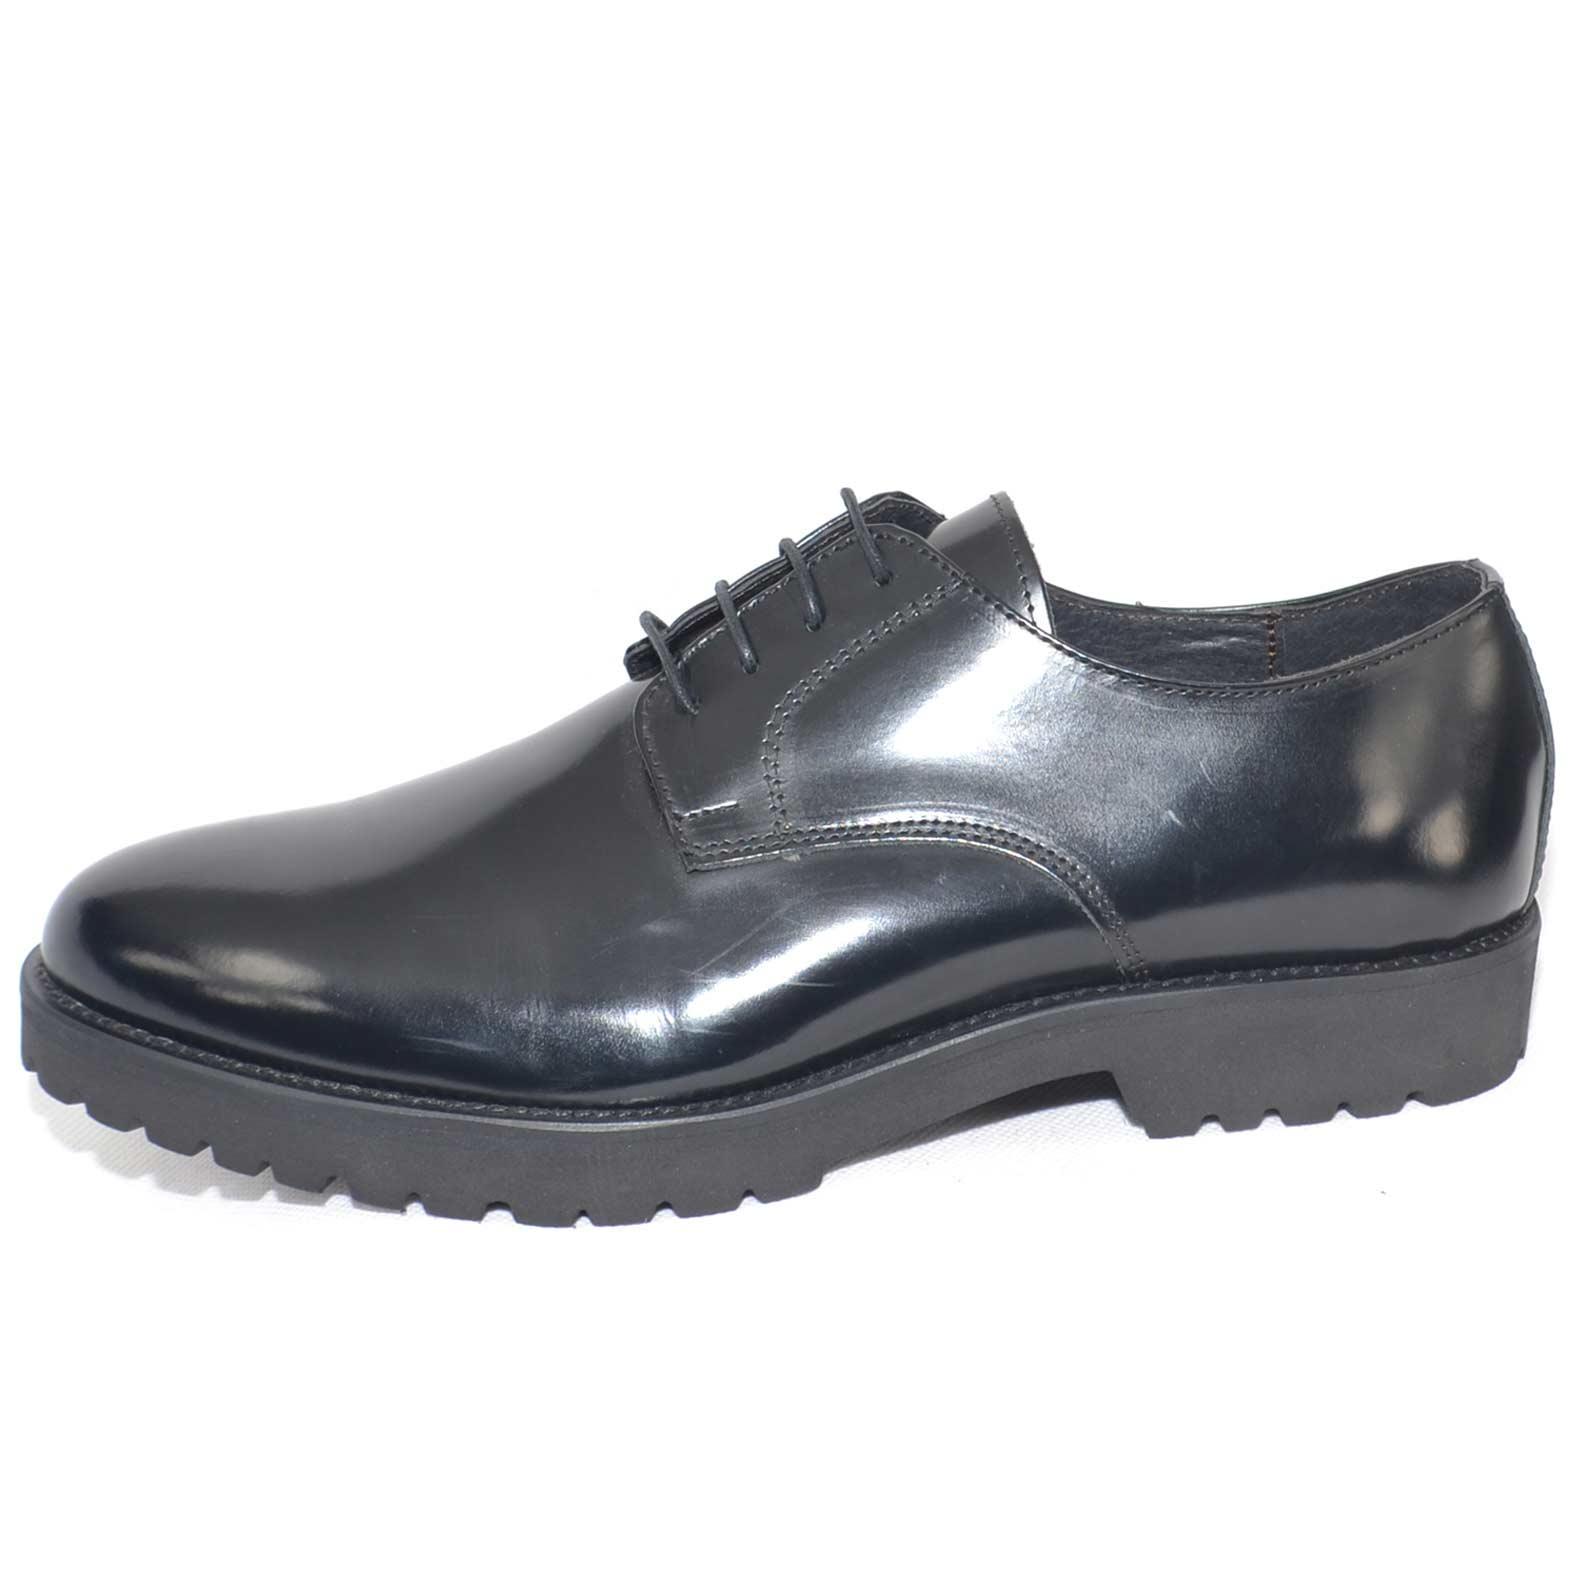 scarpe uomo stringate vera pelle abrasivato nero lucido made in italy fondo antiscivolo artigianale cerimonia elegante uomo stringate Malu Shoes  